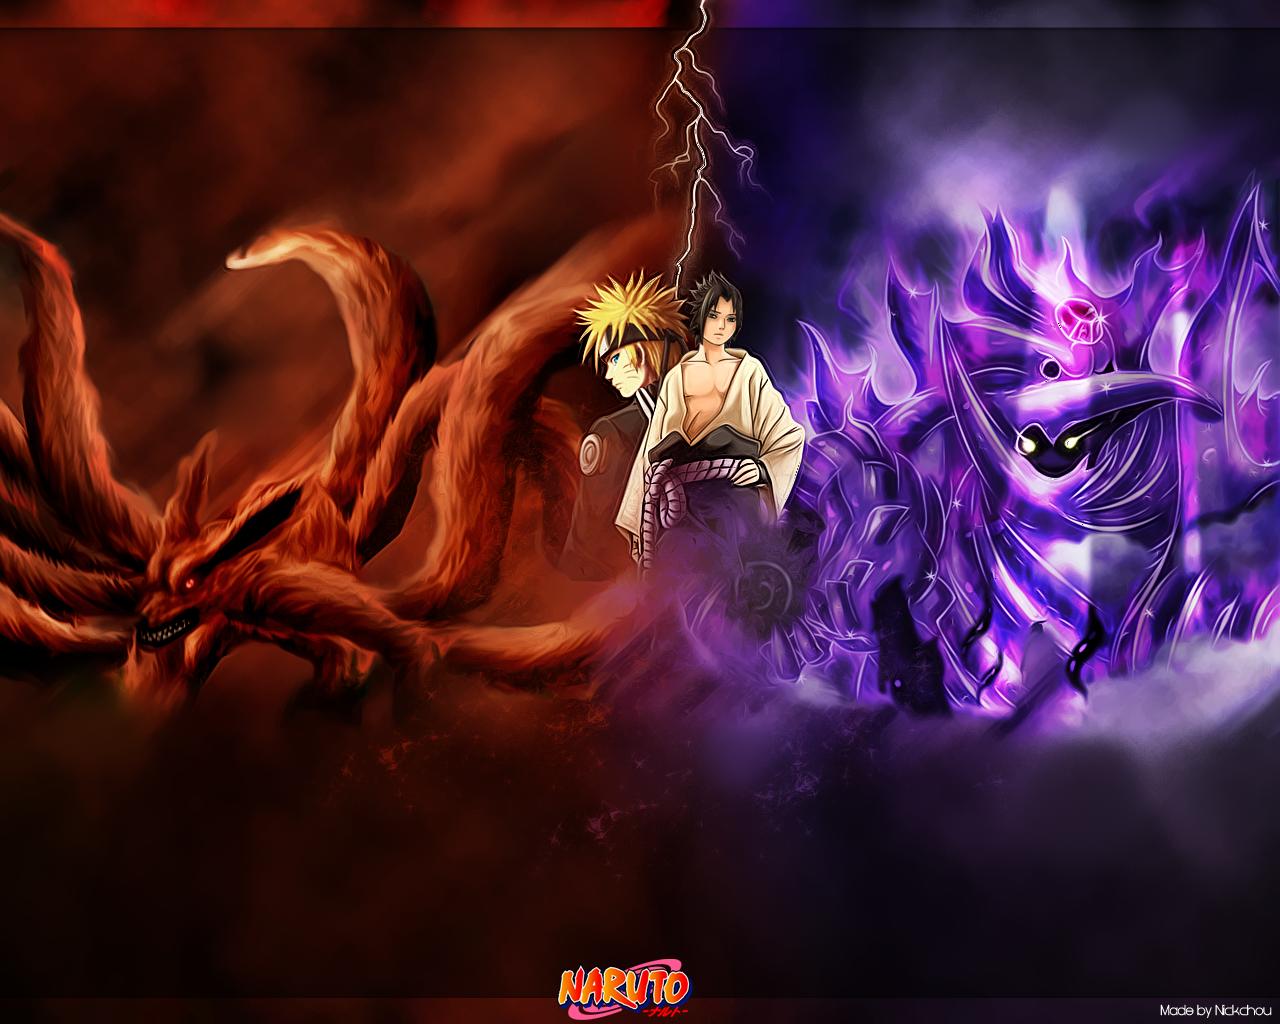 Naruto wallpaper by NickchouBG 1280x1024